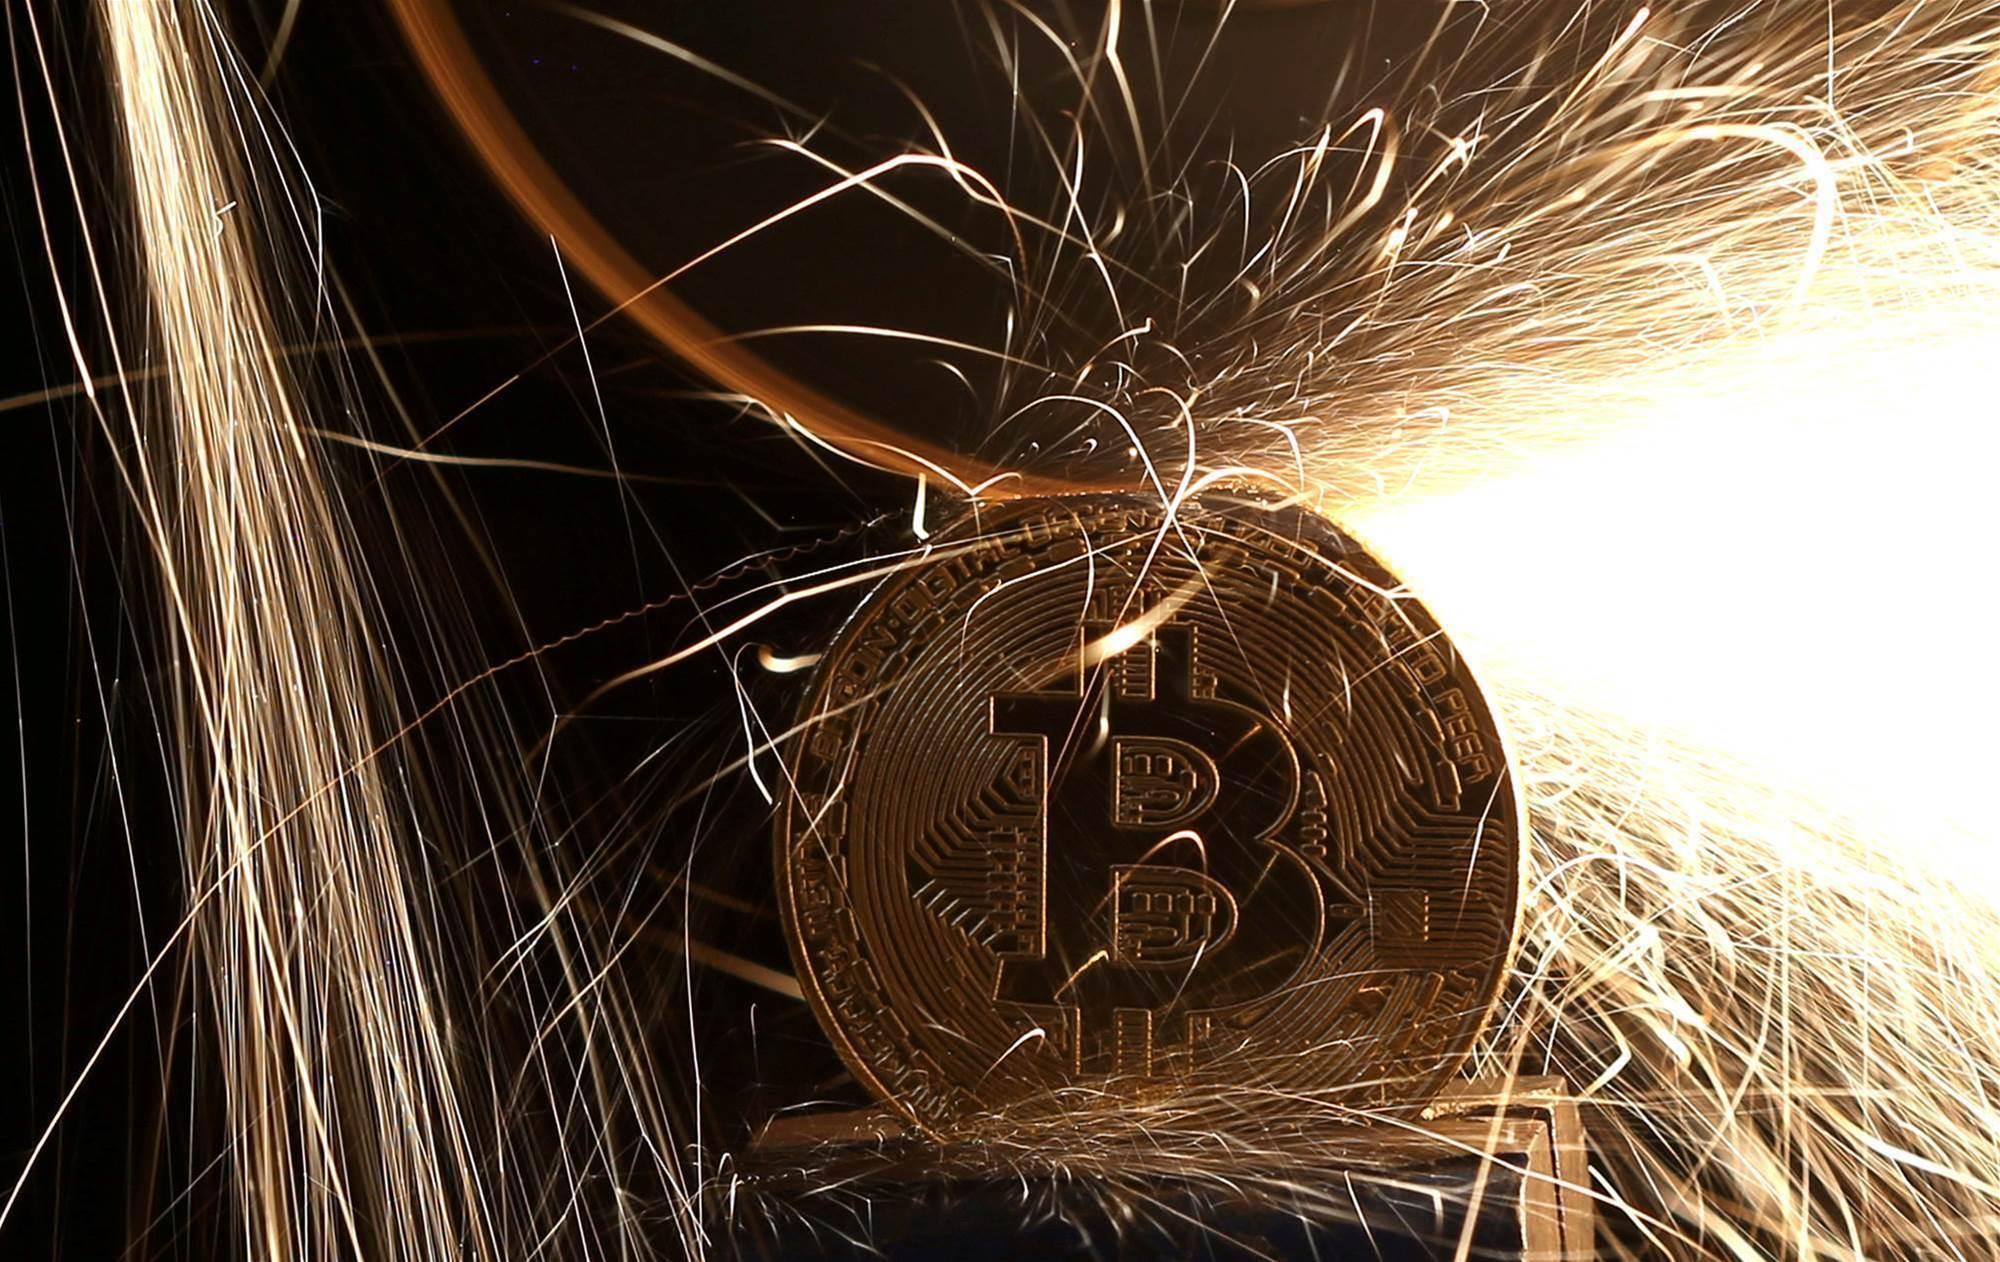 Bitcoin slumps below US$10,000 after losing half its value